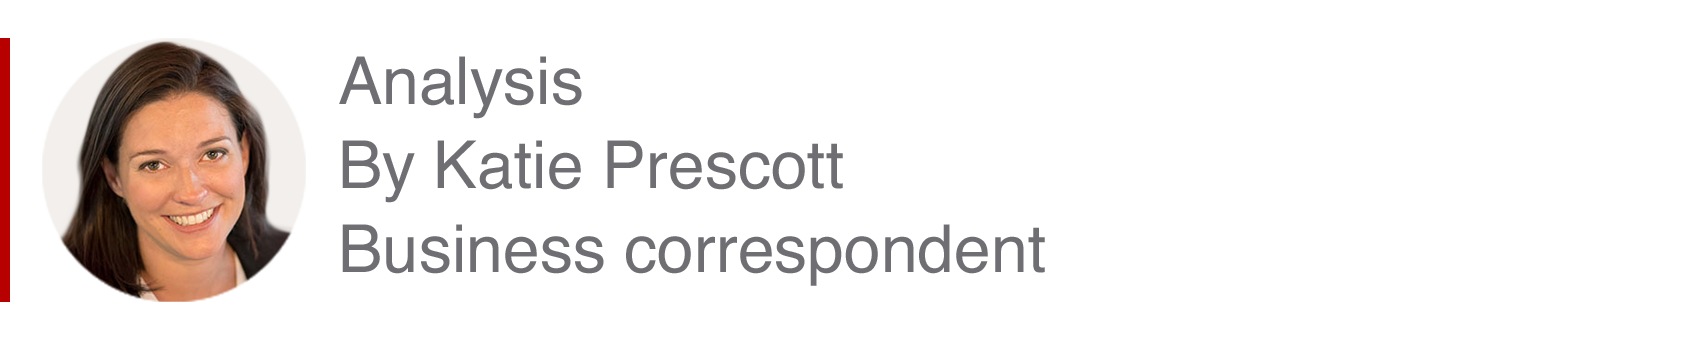 Analysis box by Katie Prescott, Business correspondent